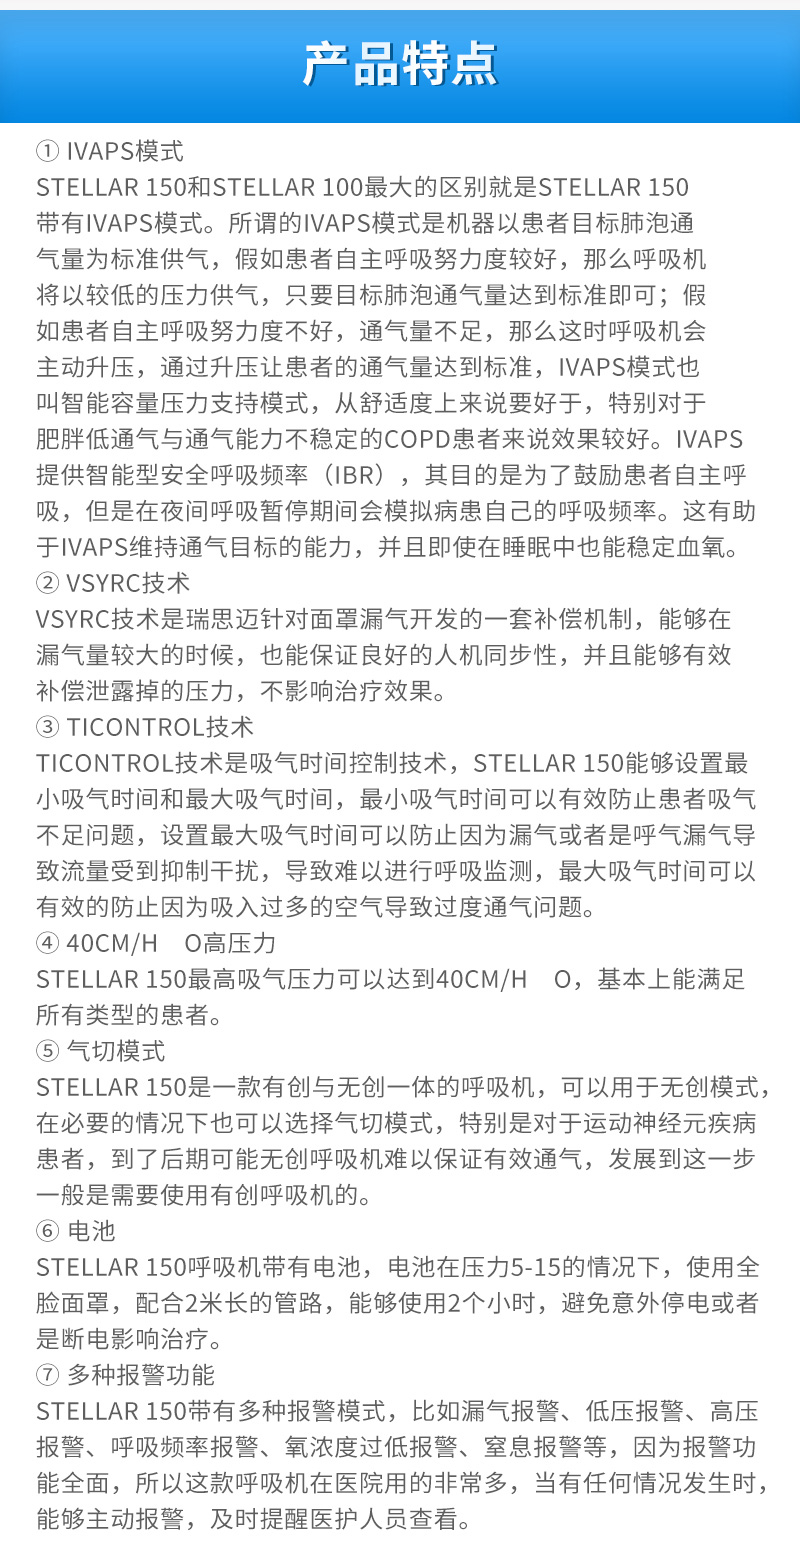 V276129+瑞思迈-呼吸机-Ventilator-Stellar-150_02.jpg